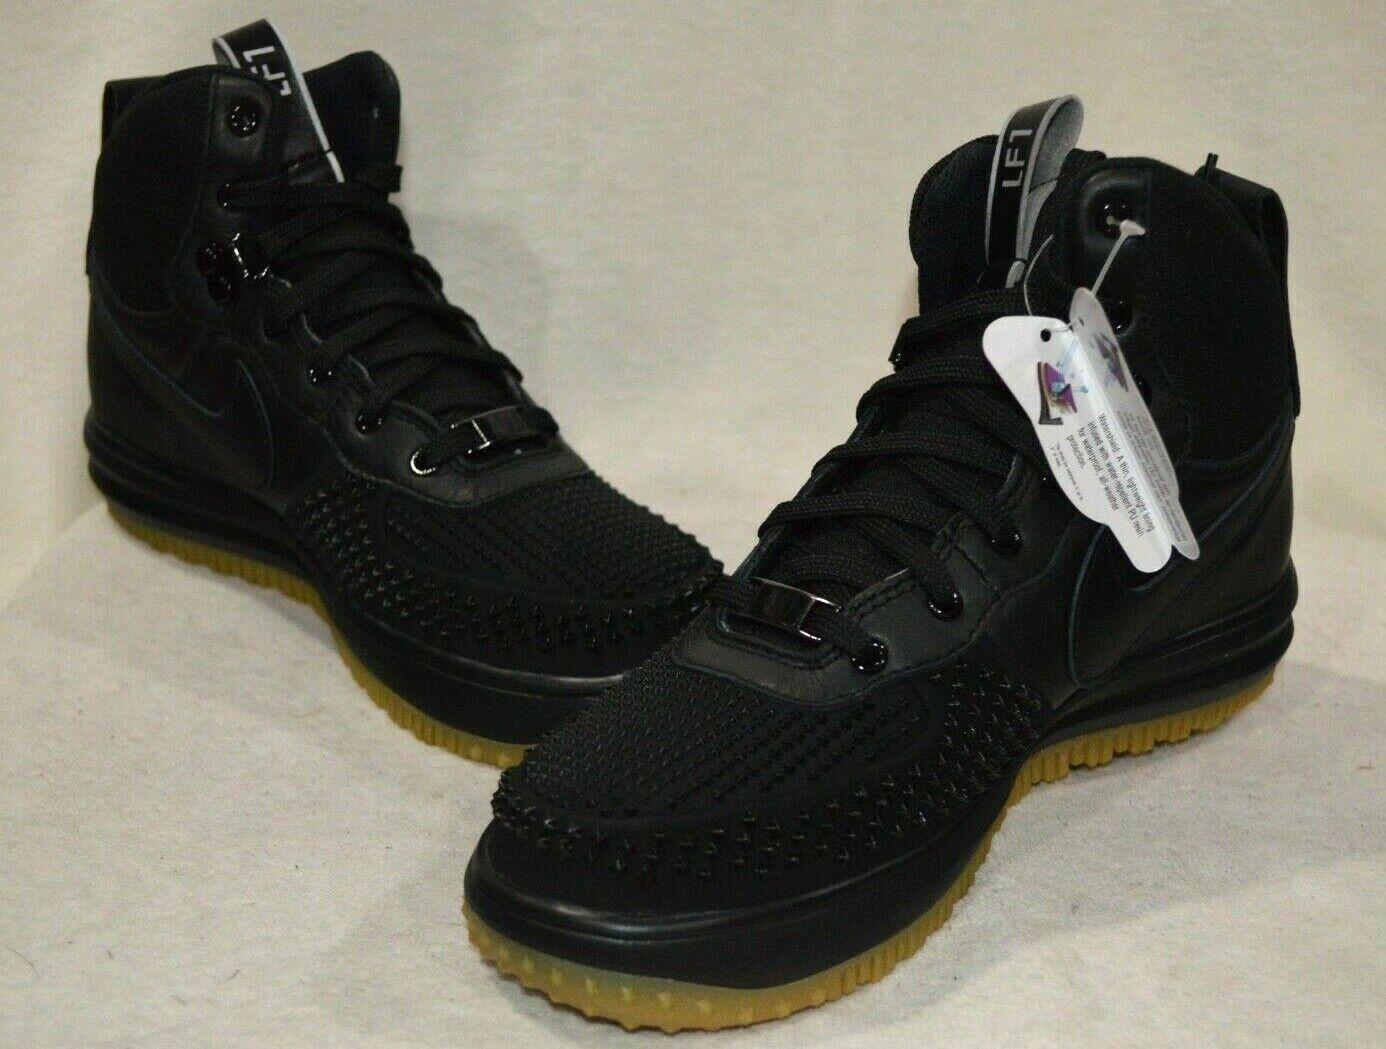 Nike Lunar Force 1 Duckboot (GS) BlackSilver Leather Boy's Boots Sz 4.55.5 NWB